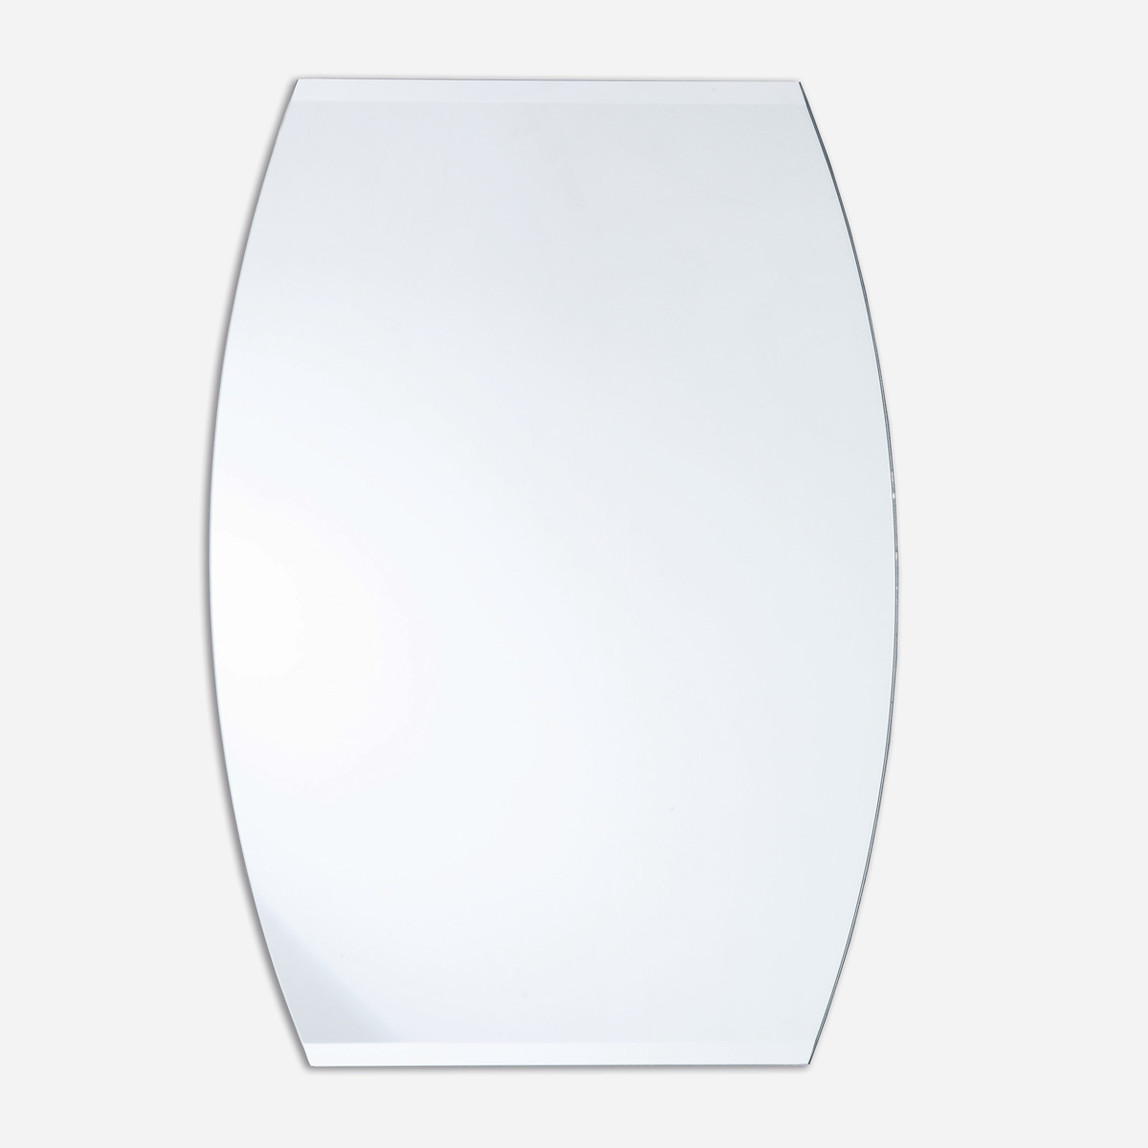 Küçük Yarım Oval Kesik Ayna